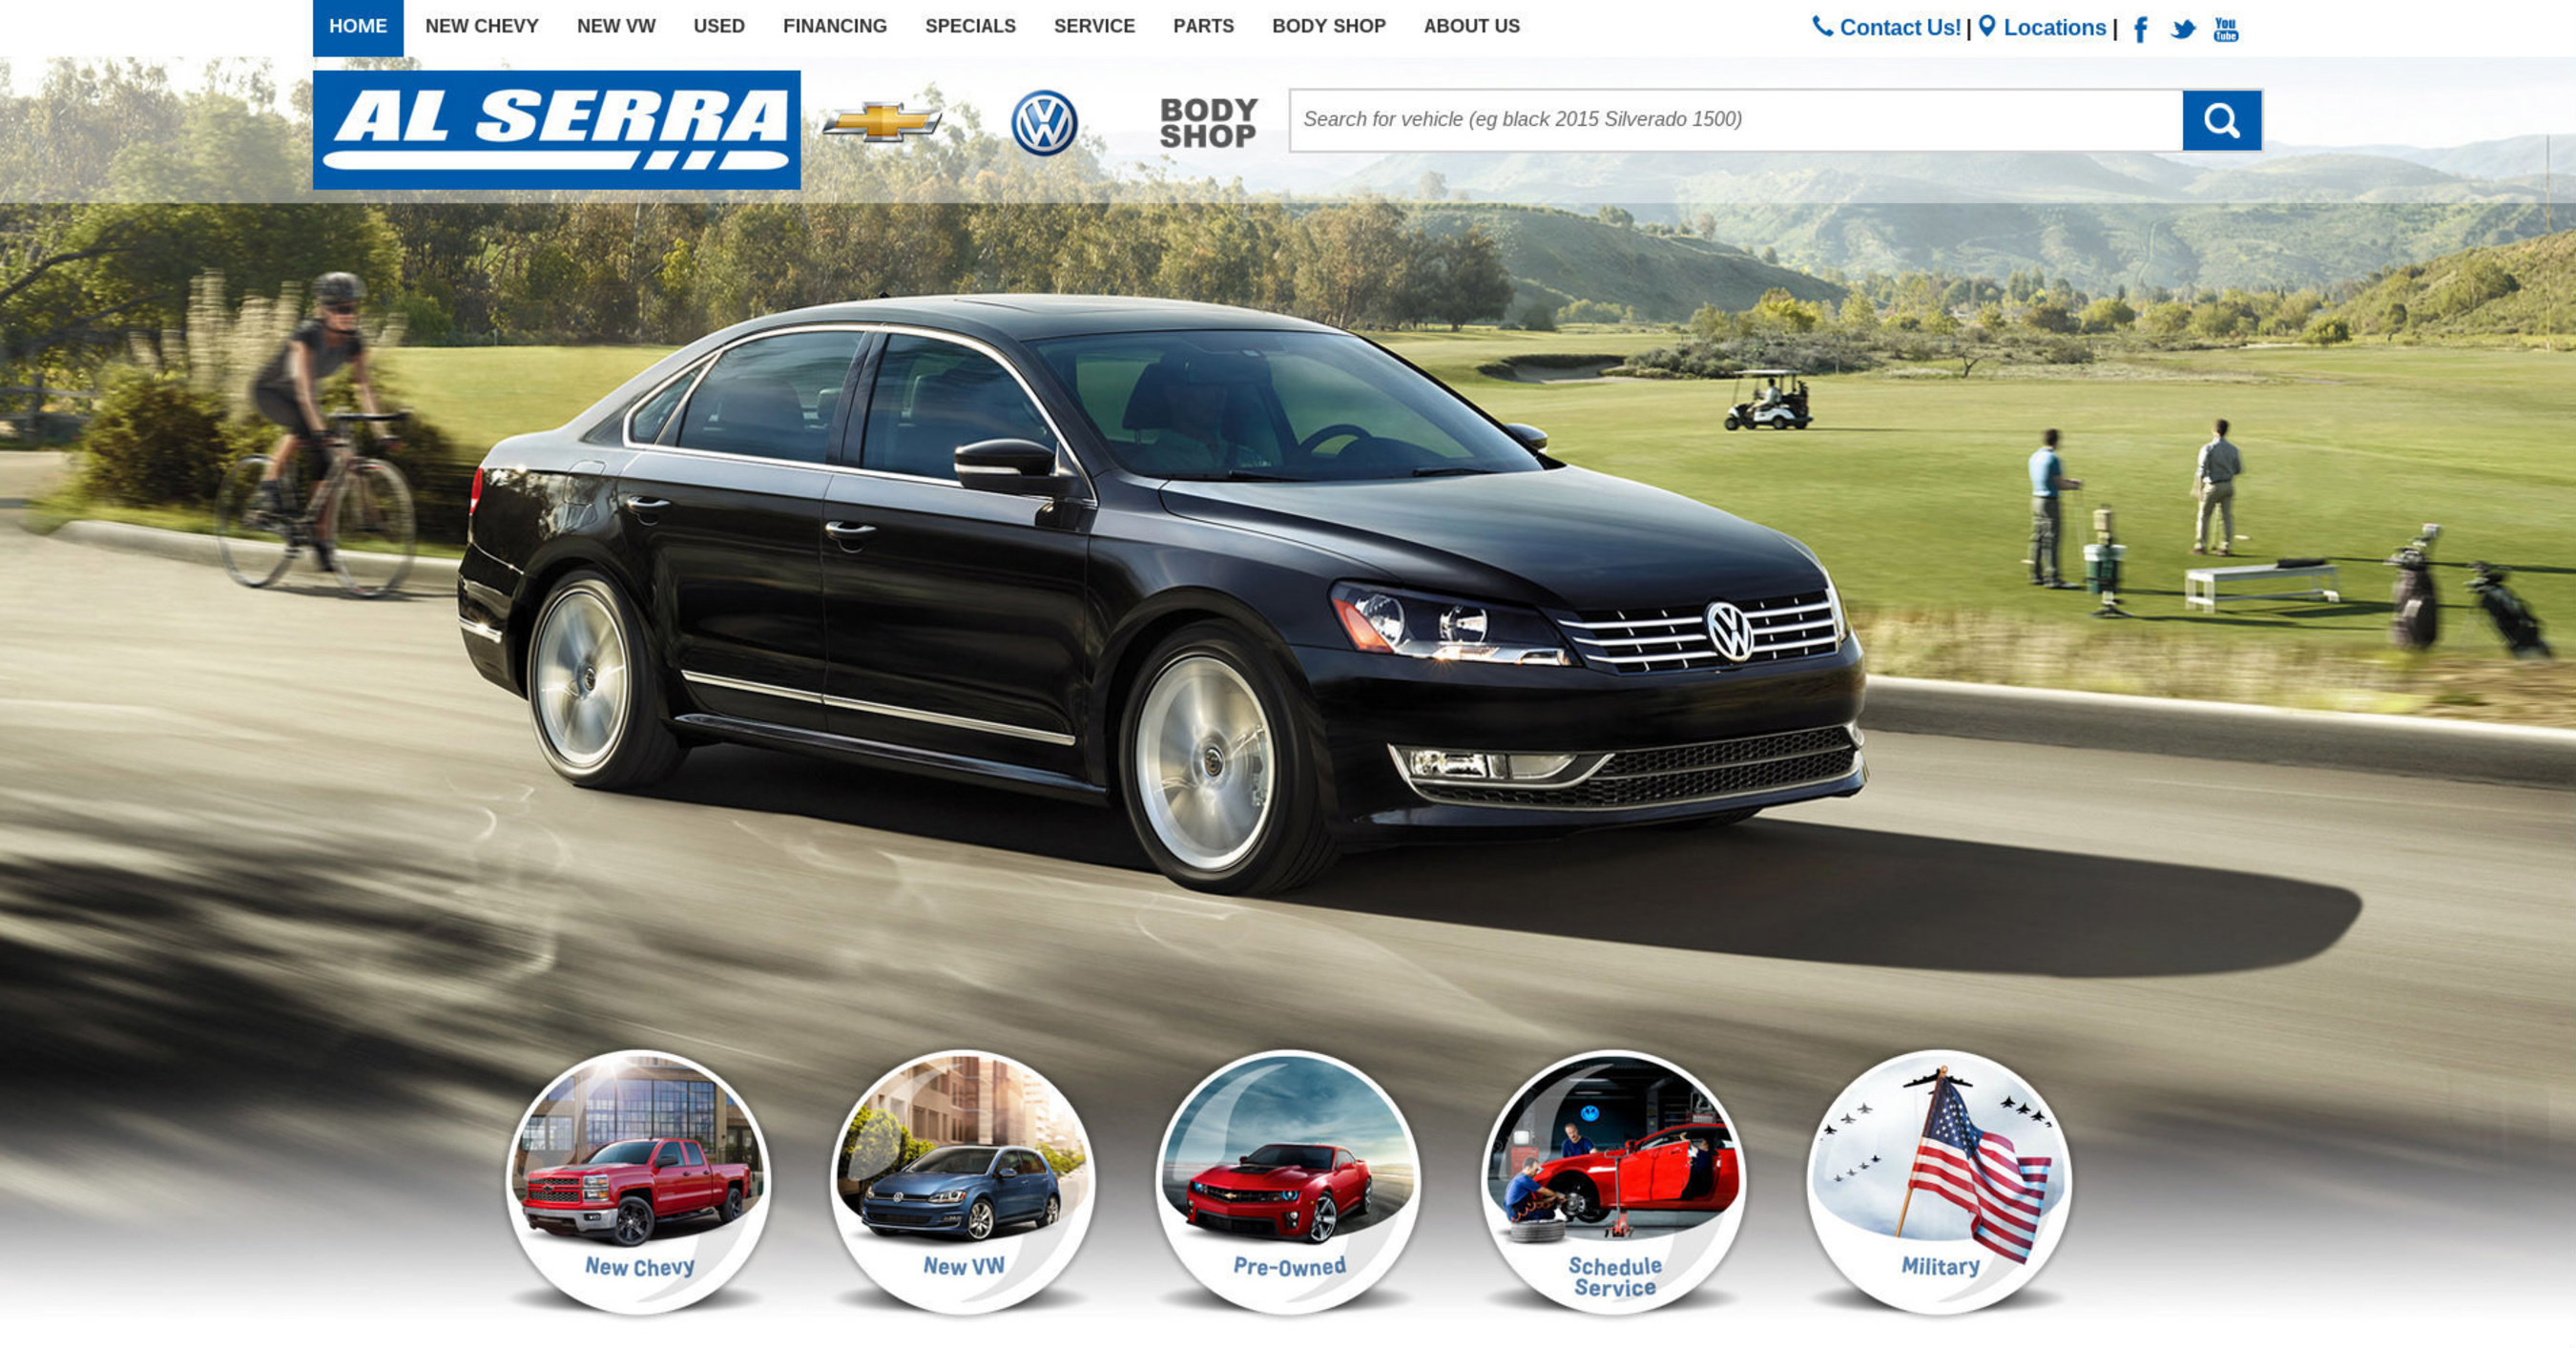 Al Serra Colorado launches new website